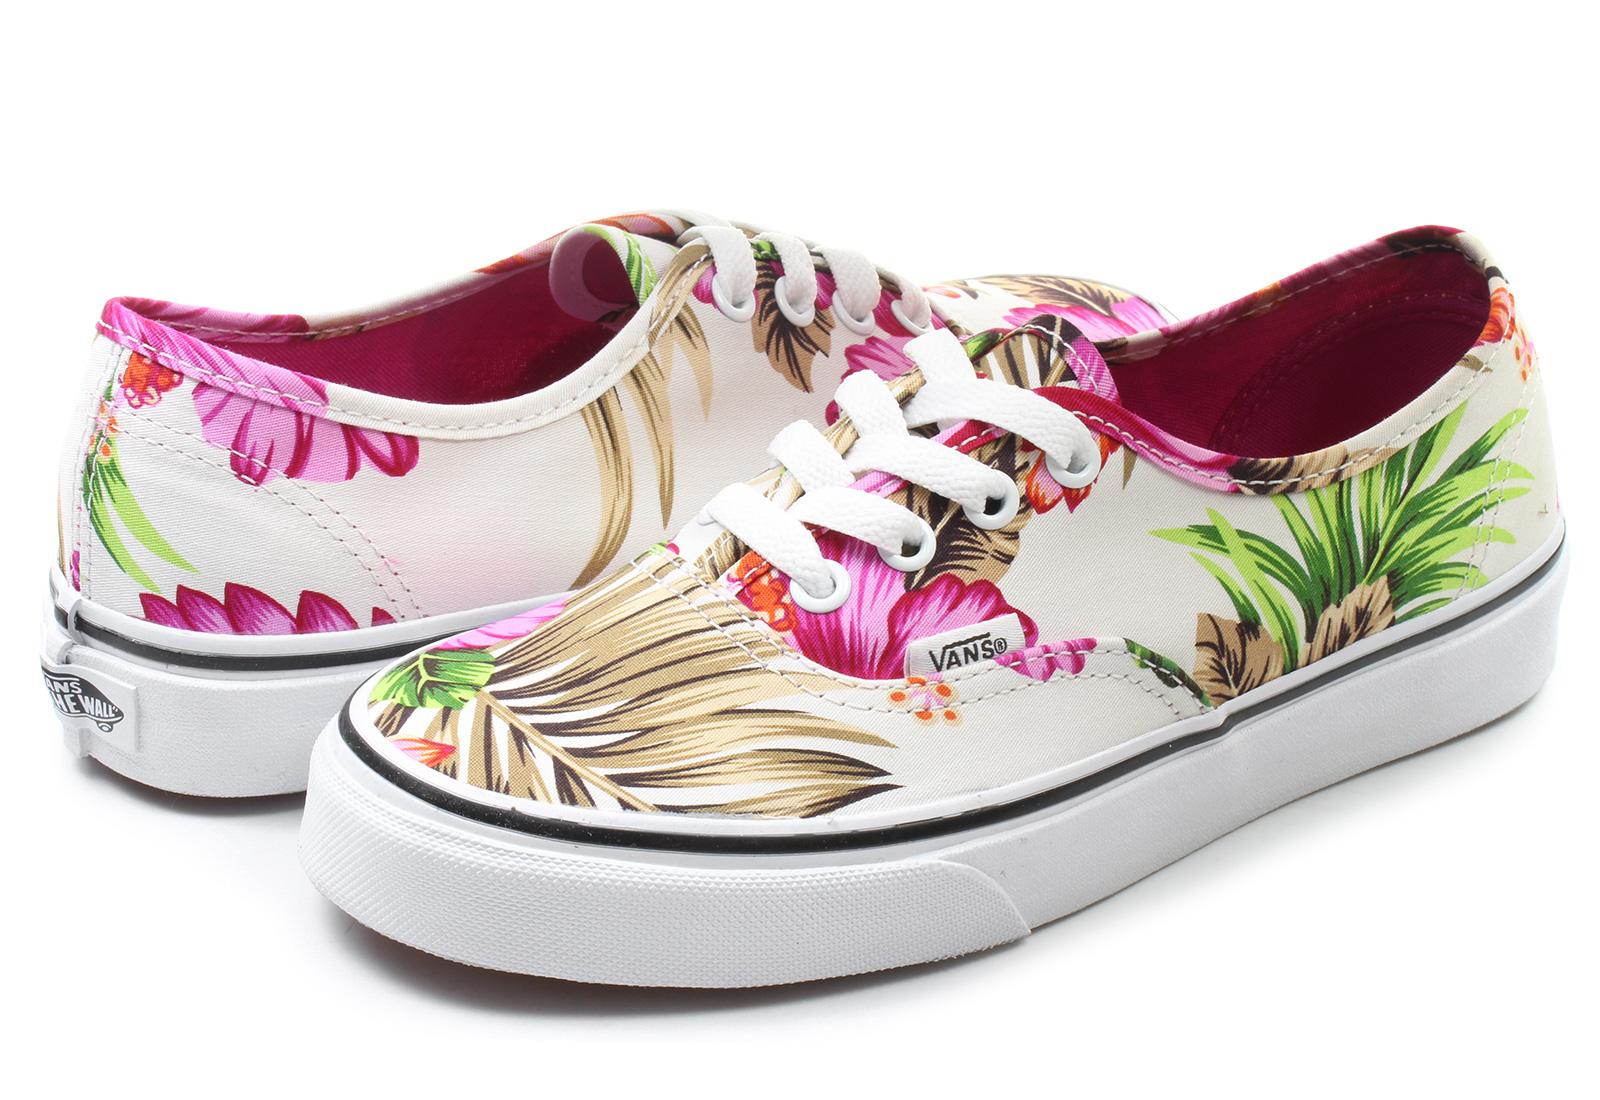 Vans Tornacipő - Authentic - VZUKFG0 - Office Shoes Magyarország b2043269c2